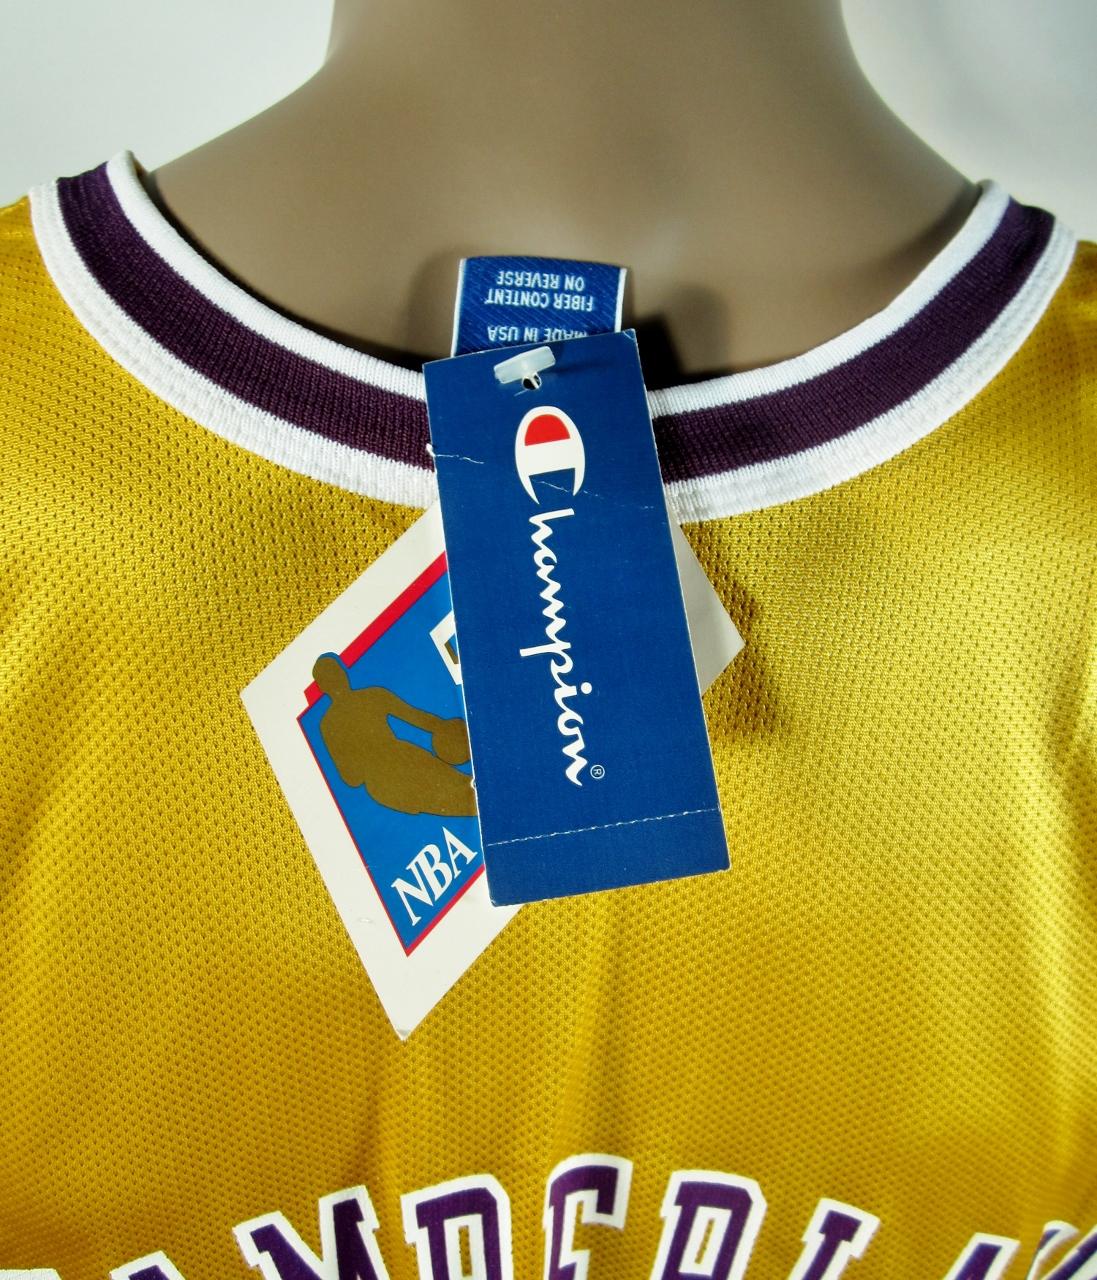 5992a30be38 ... Wilt Chamberlain Los Angeles Lakers NBA 50 Gold logo Champion Jersey NWT  - Thumbnail 2 ...